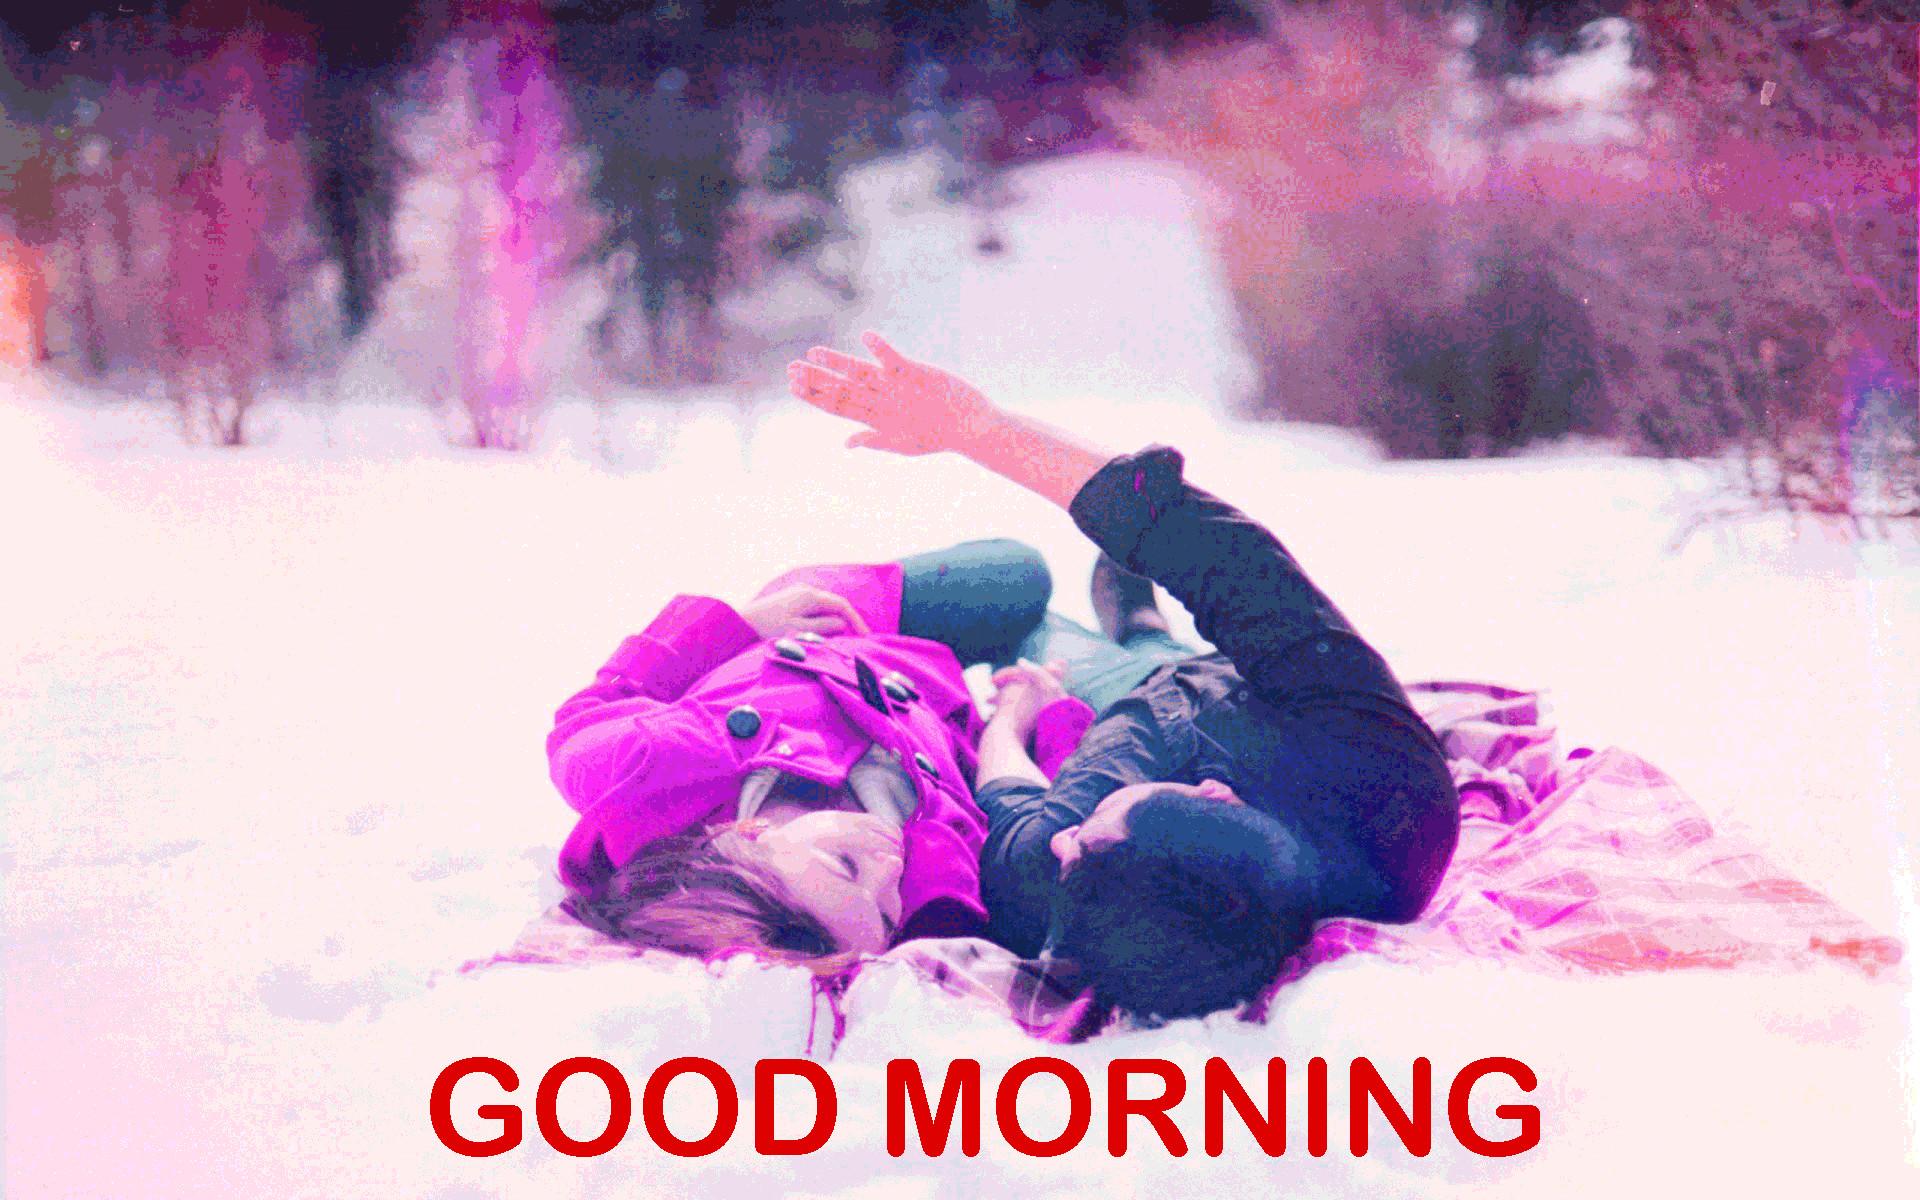 Good Morning Blessings Wallpaper 77 Images